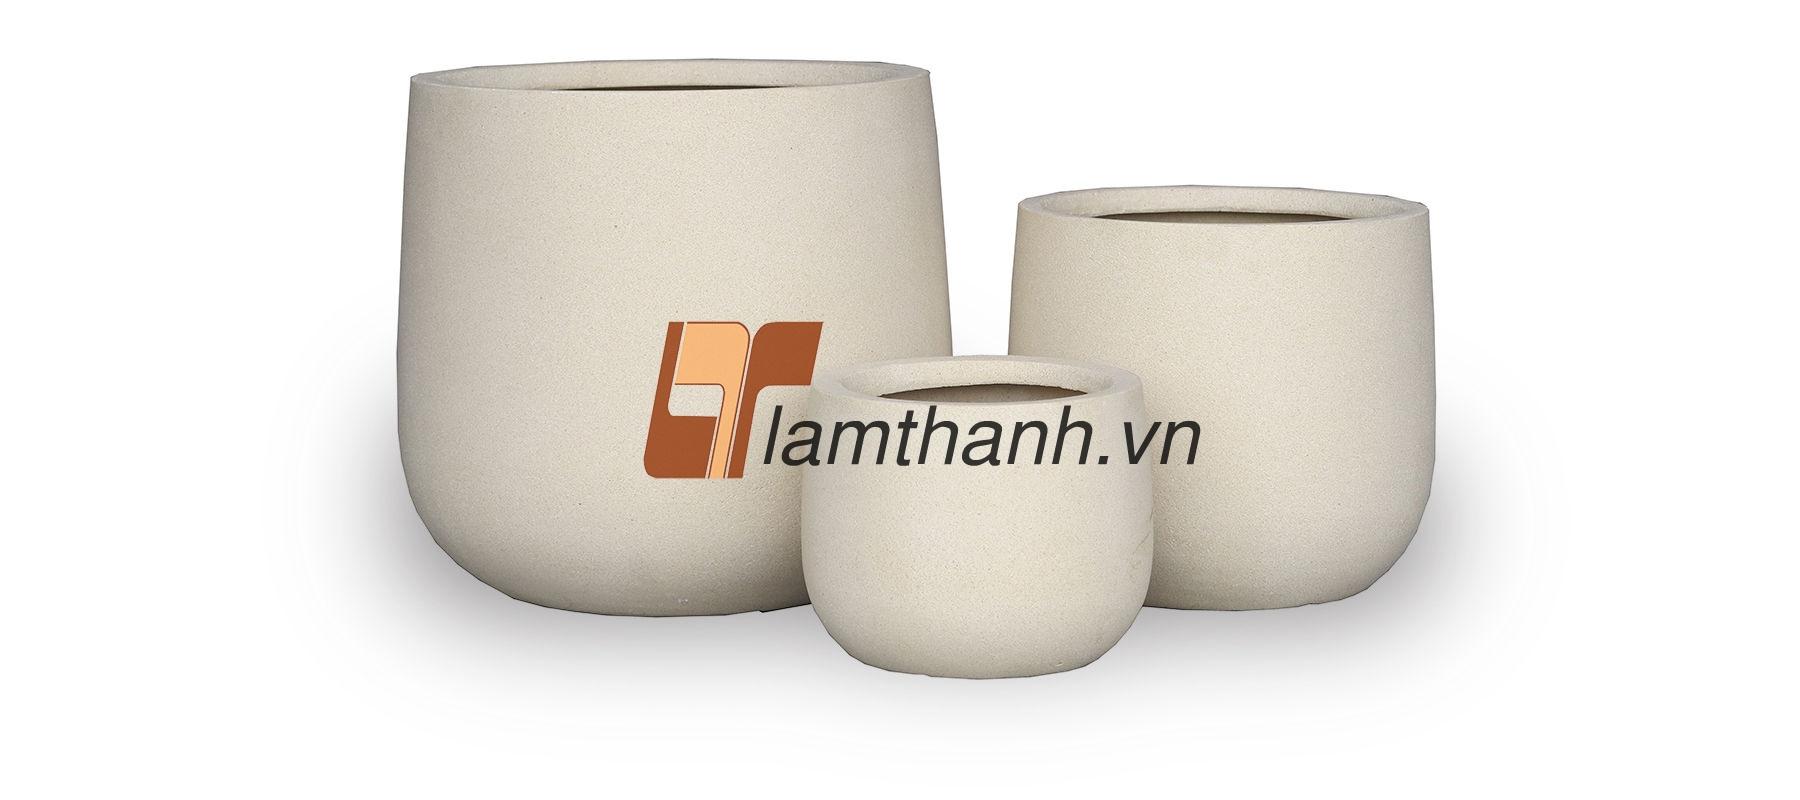 vietnam polystone, fiberstone 08